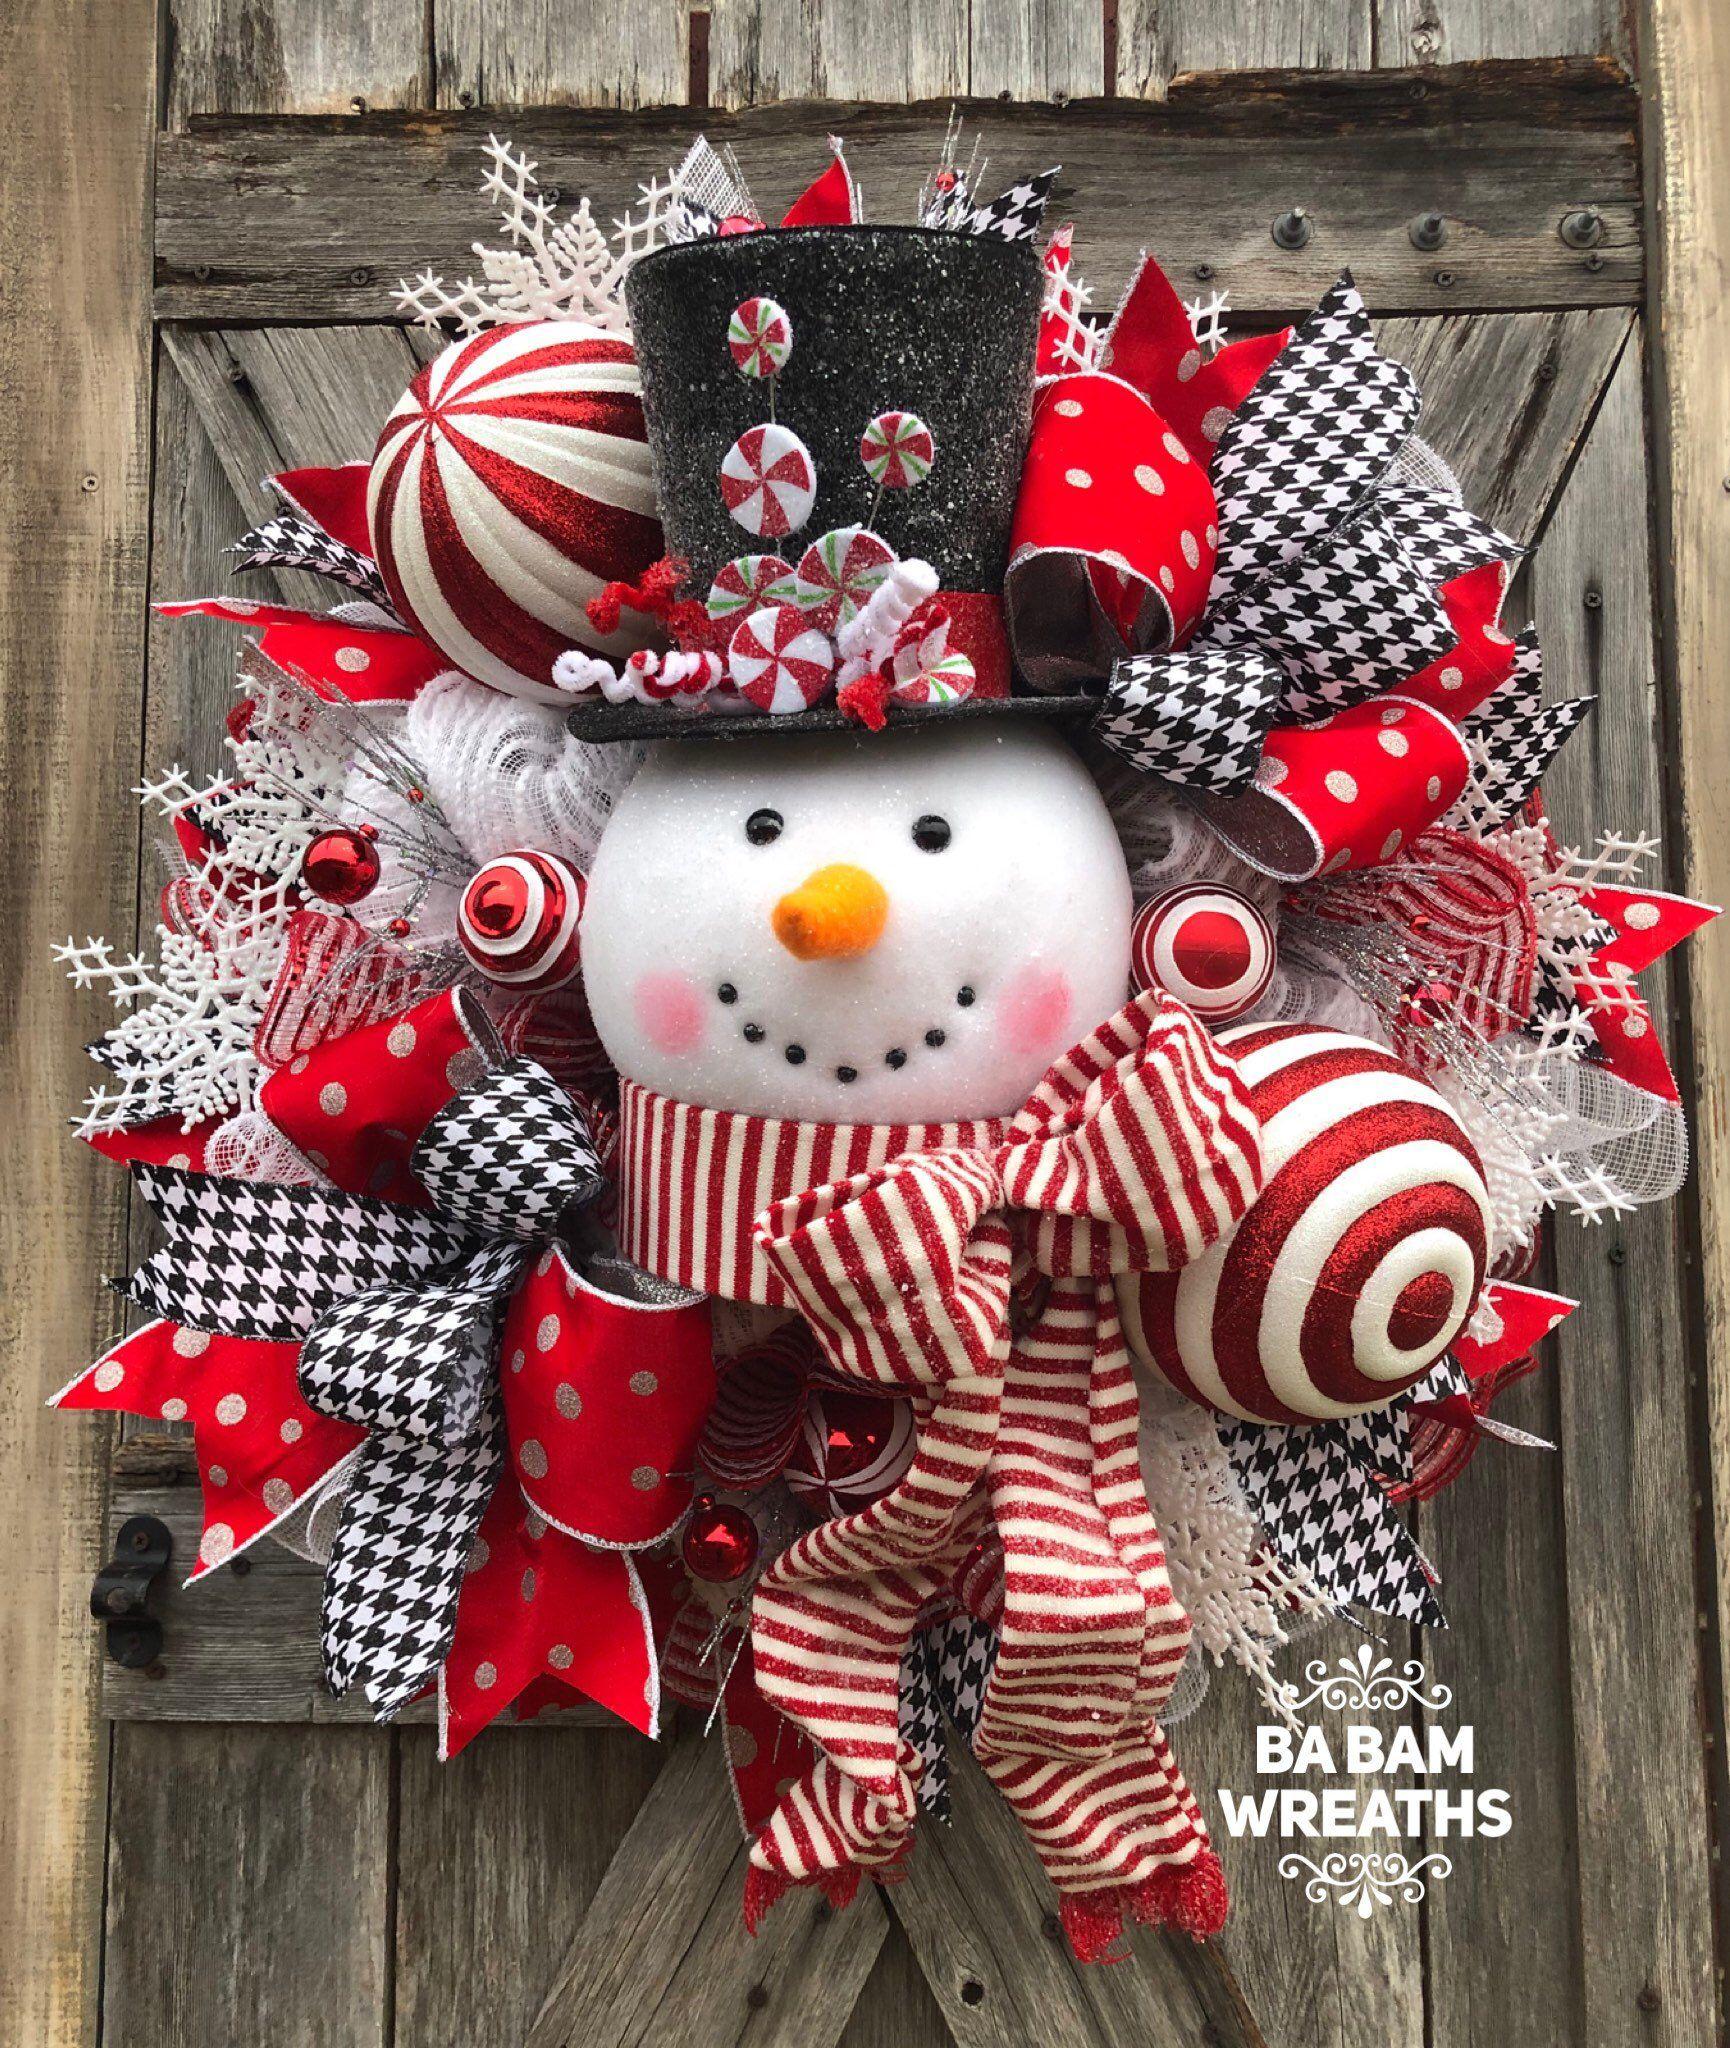 Ba Bam Wreaths Snowman Wreath Traditional Christmas Red White Christmas Decor Classic C Christmas Wreaths Christmas Decorations Wreaths Red Christmas Decor